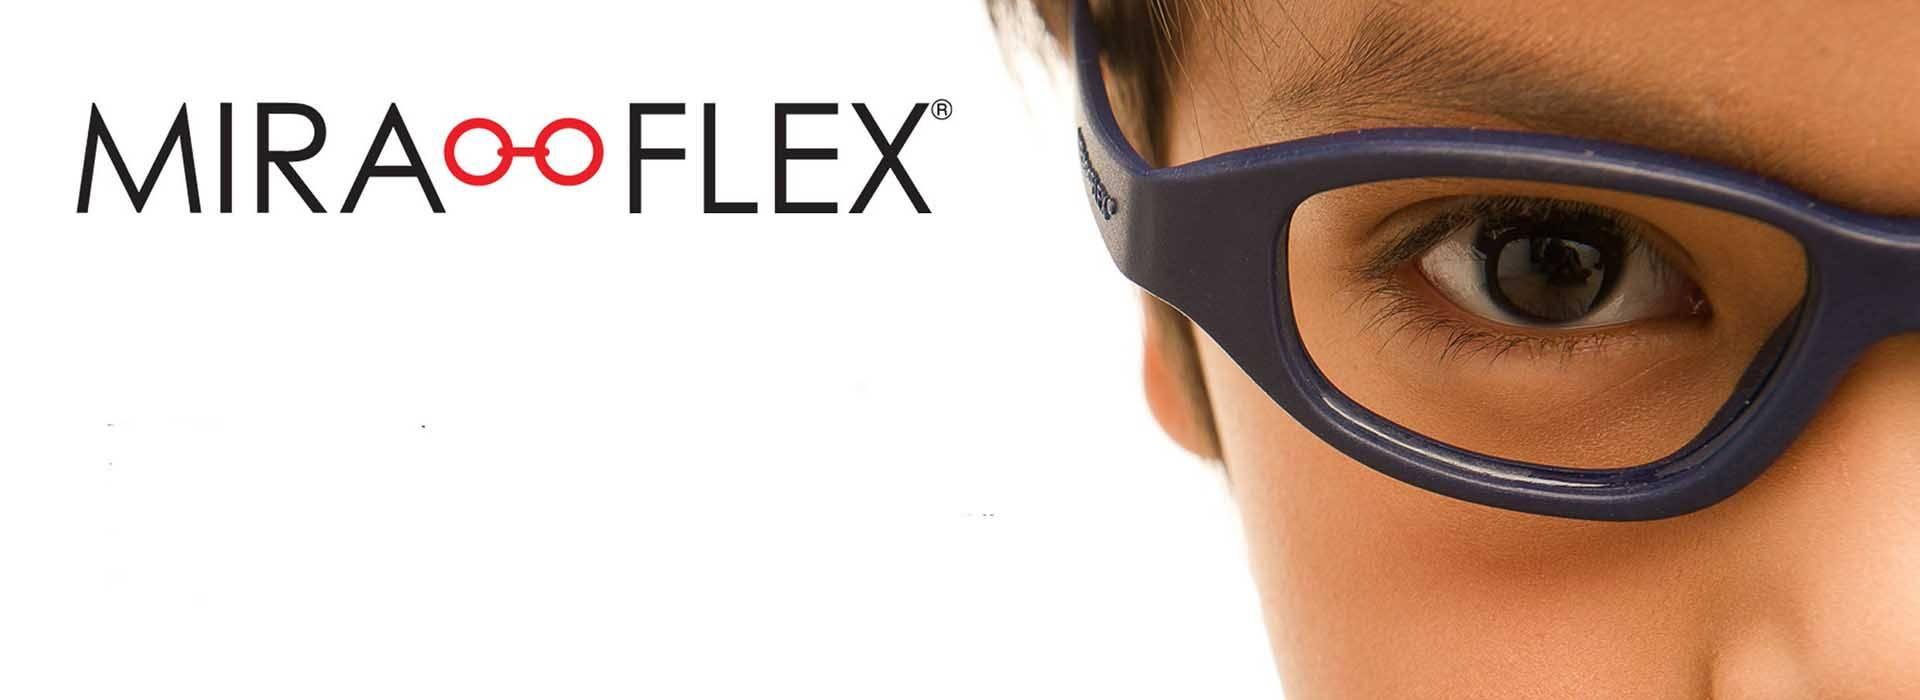 Miraflex-1